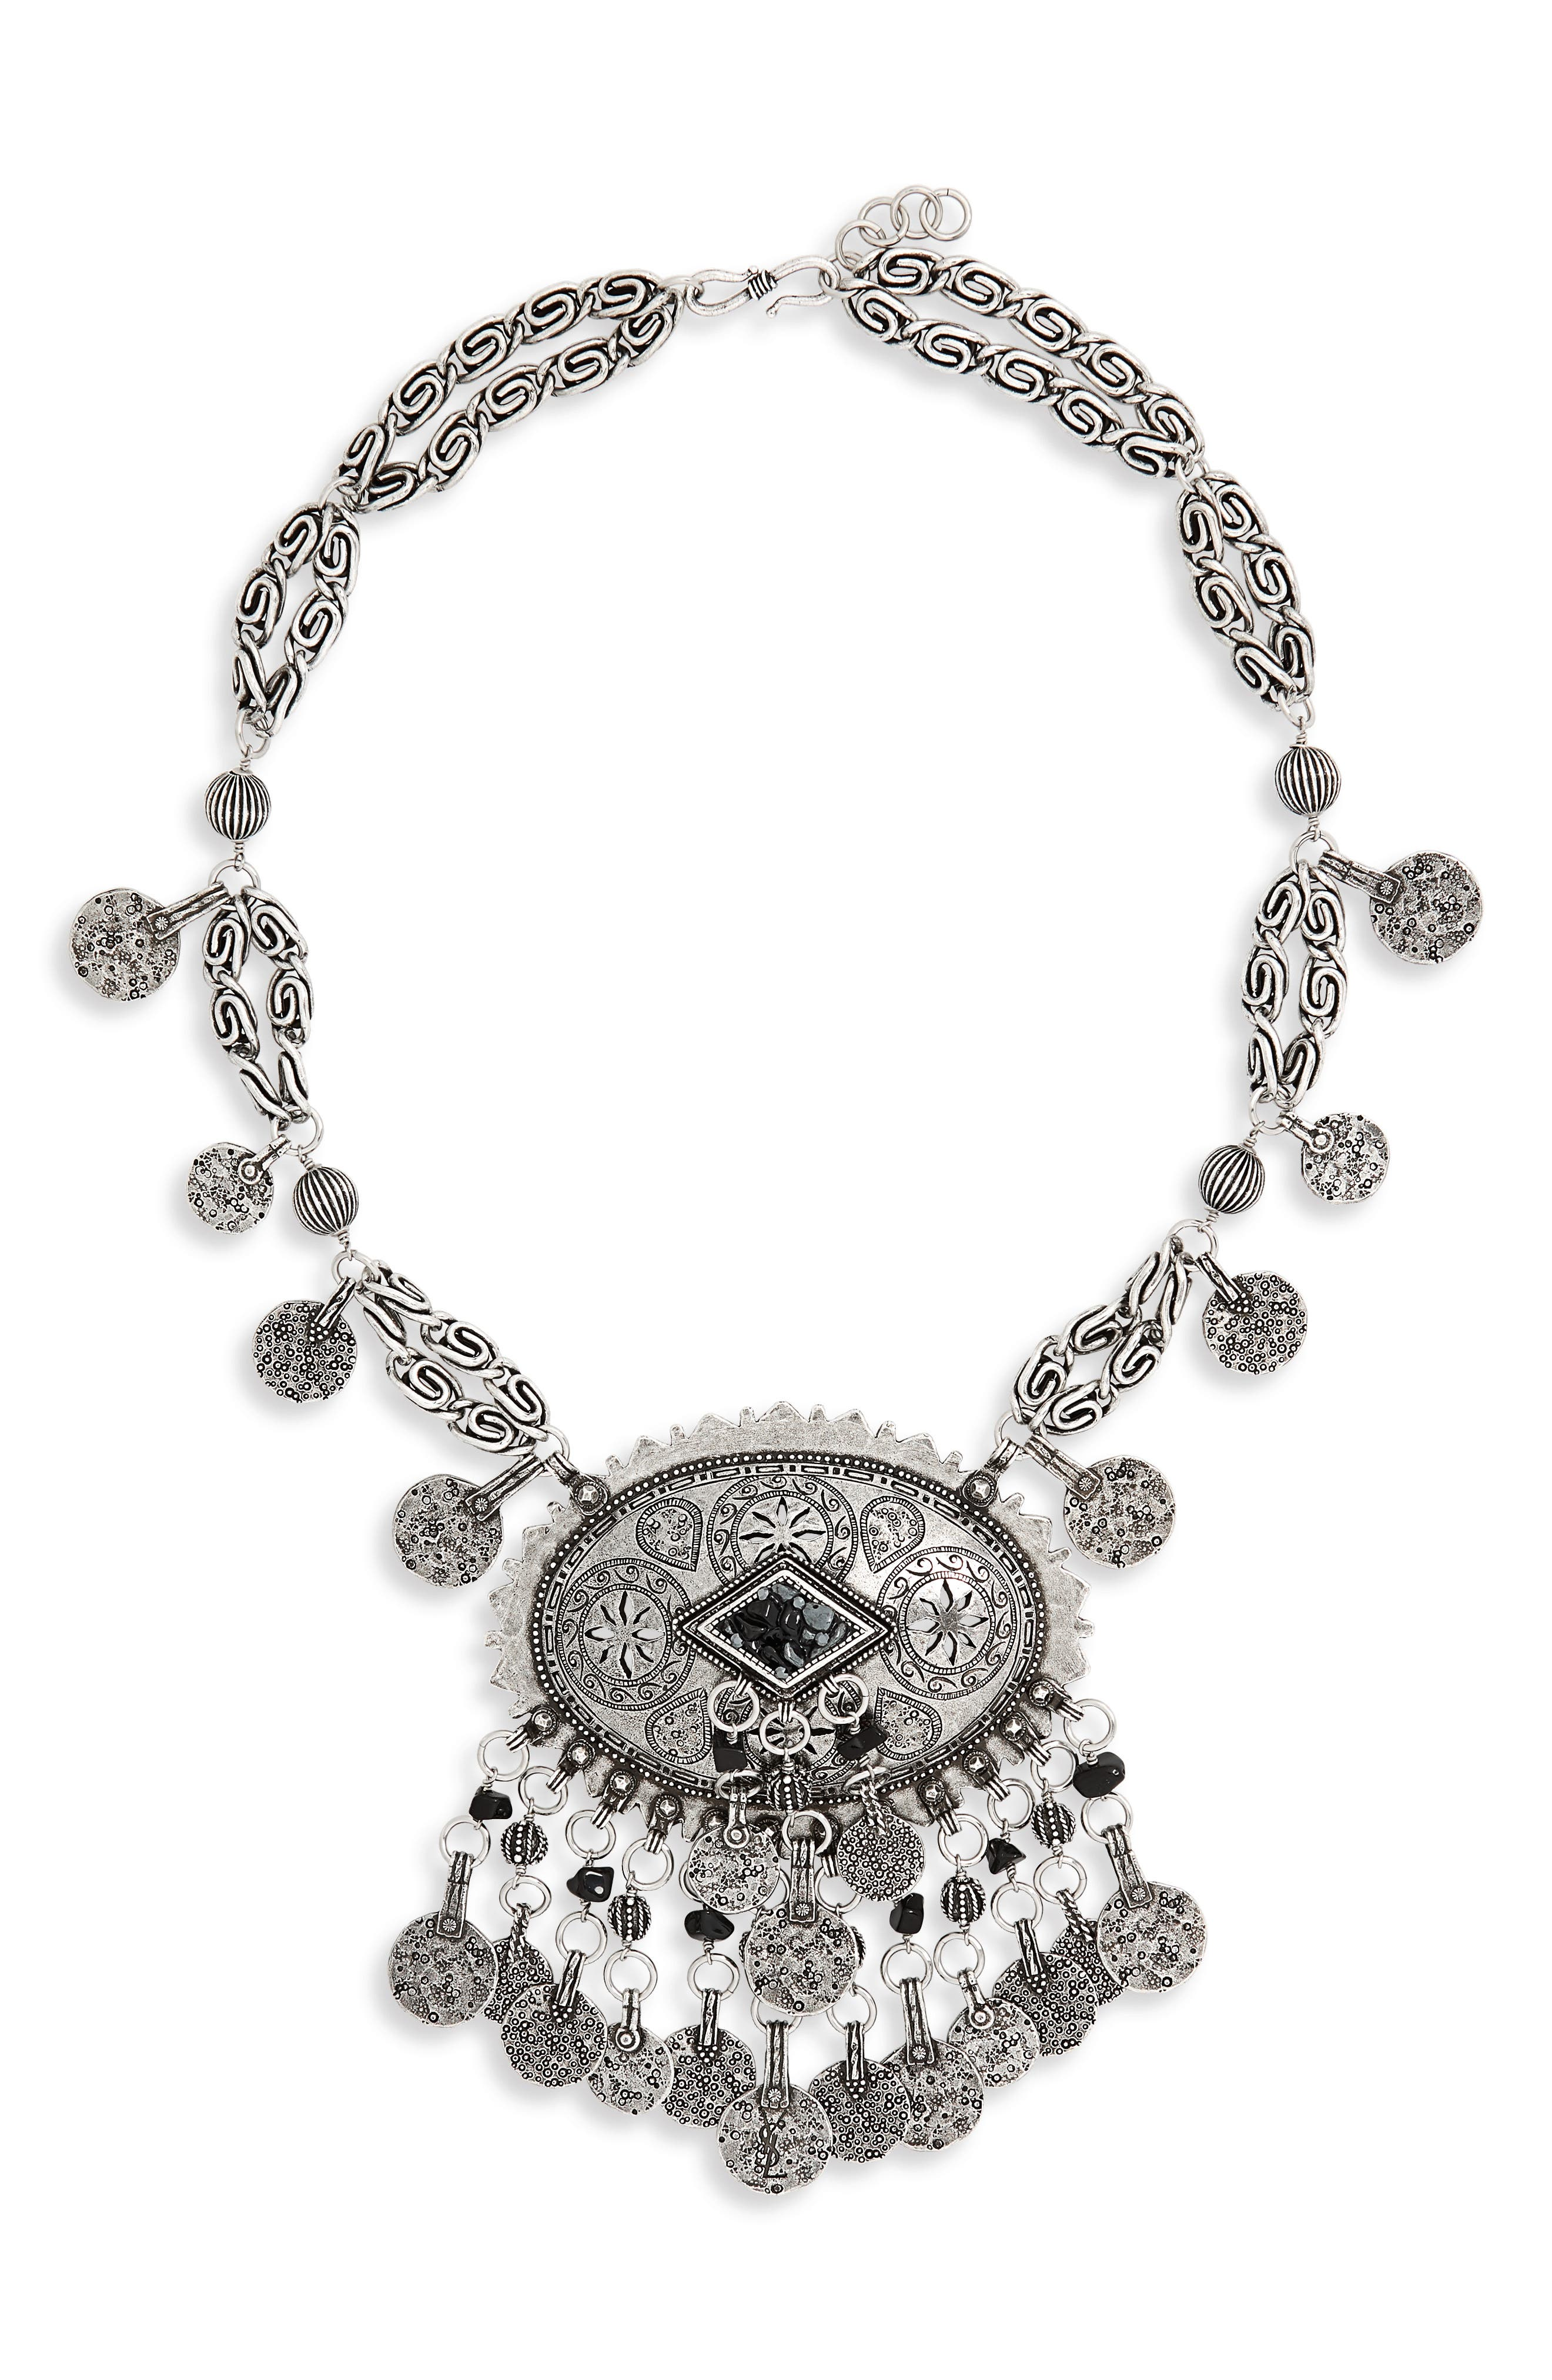 Main Image - Saint Laurent Marrak Berbere Collar Necklace